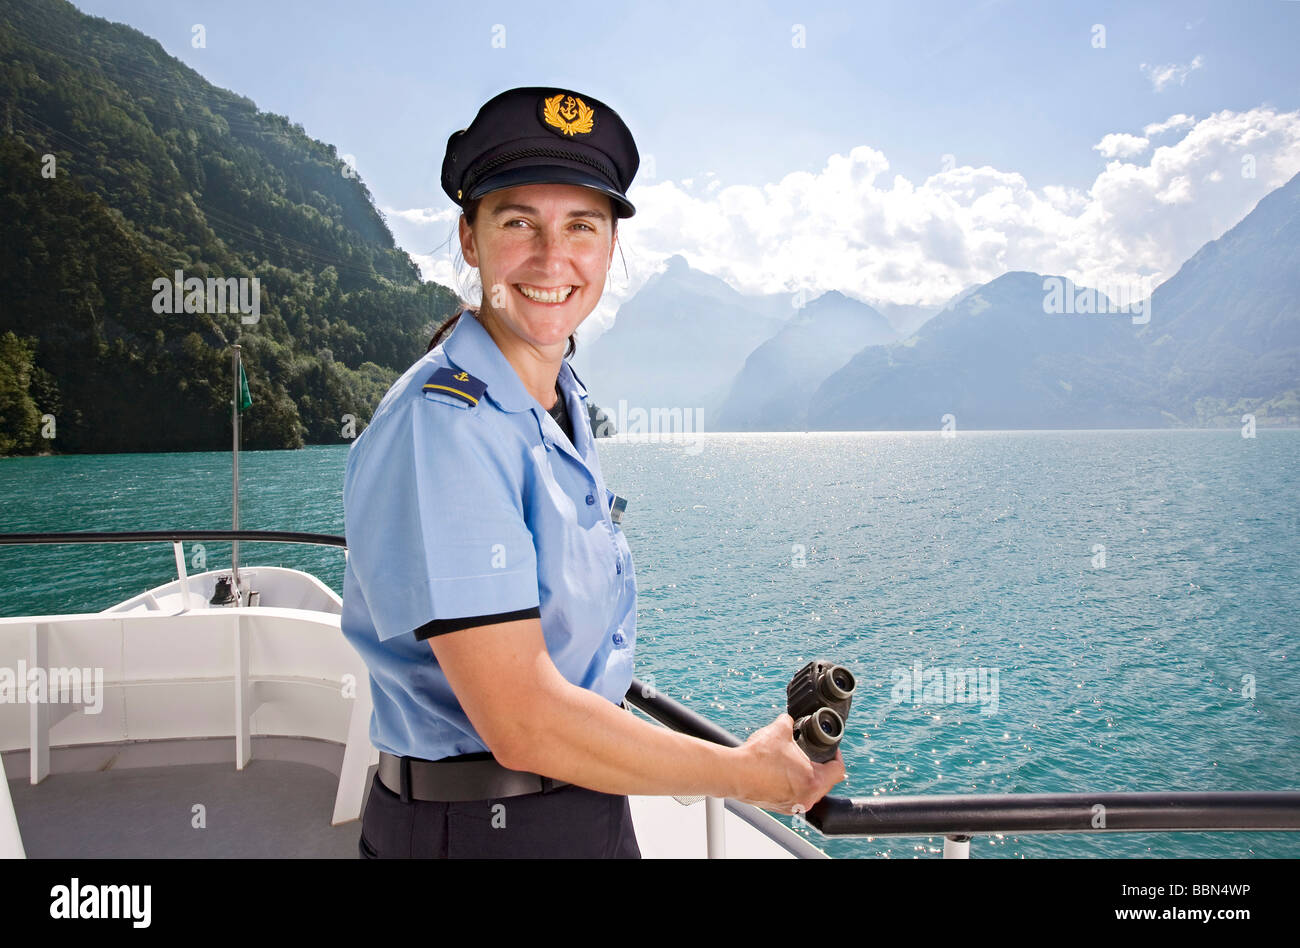 Ship's captain of a passenger motor vessel on Lake Lucerne, Switzerland, Europe - Stock Image